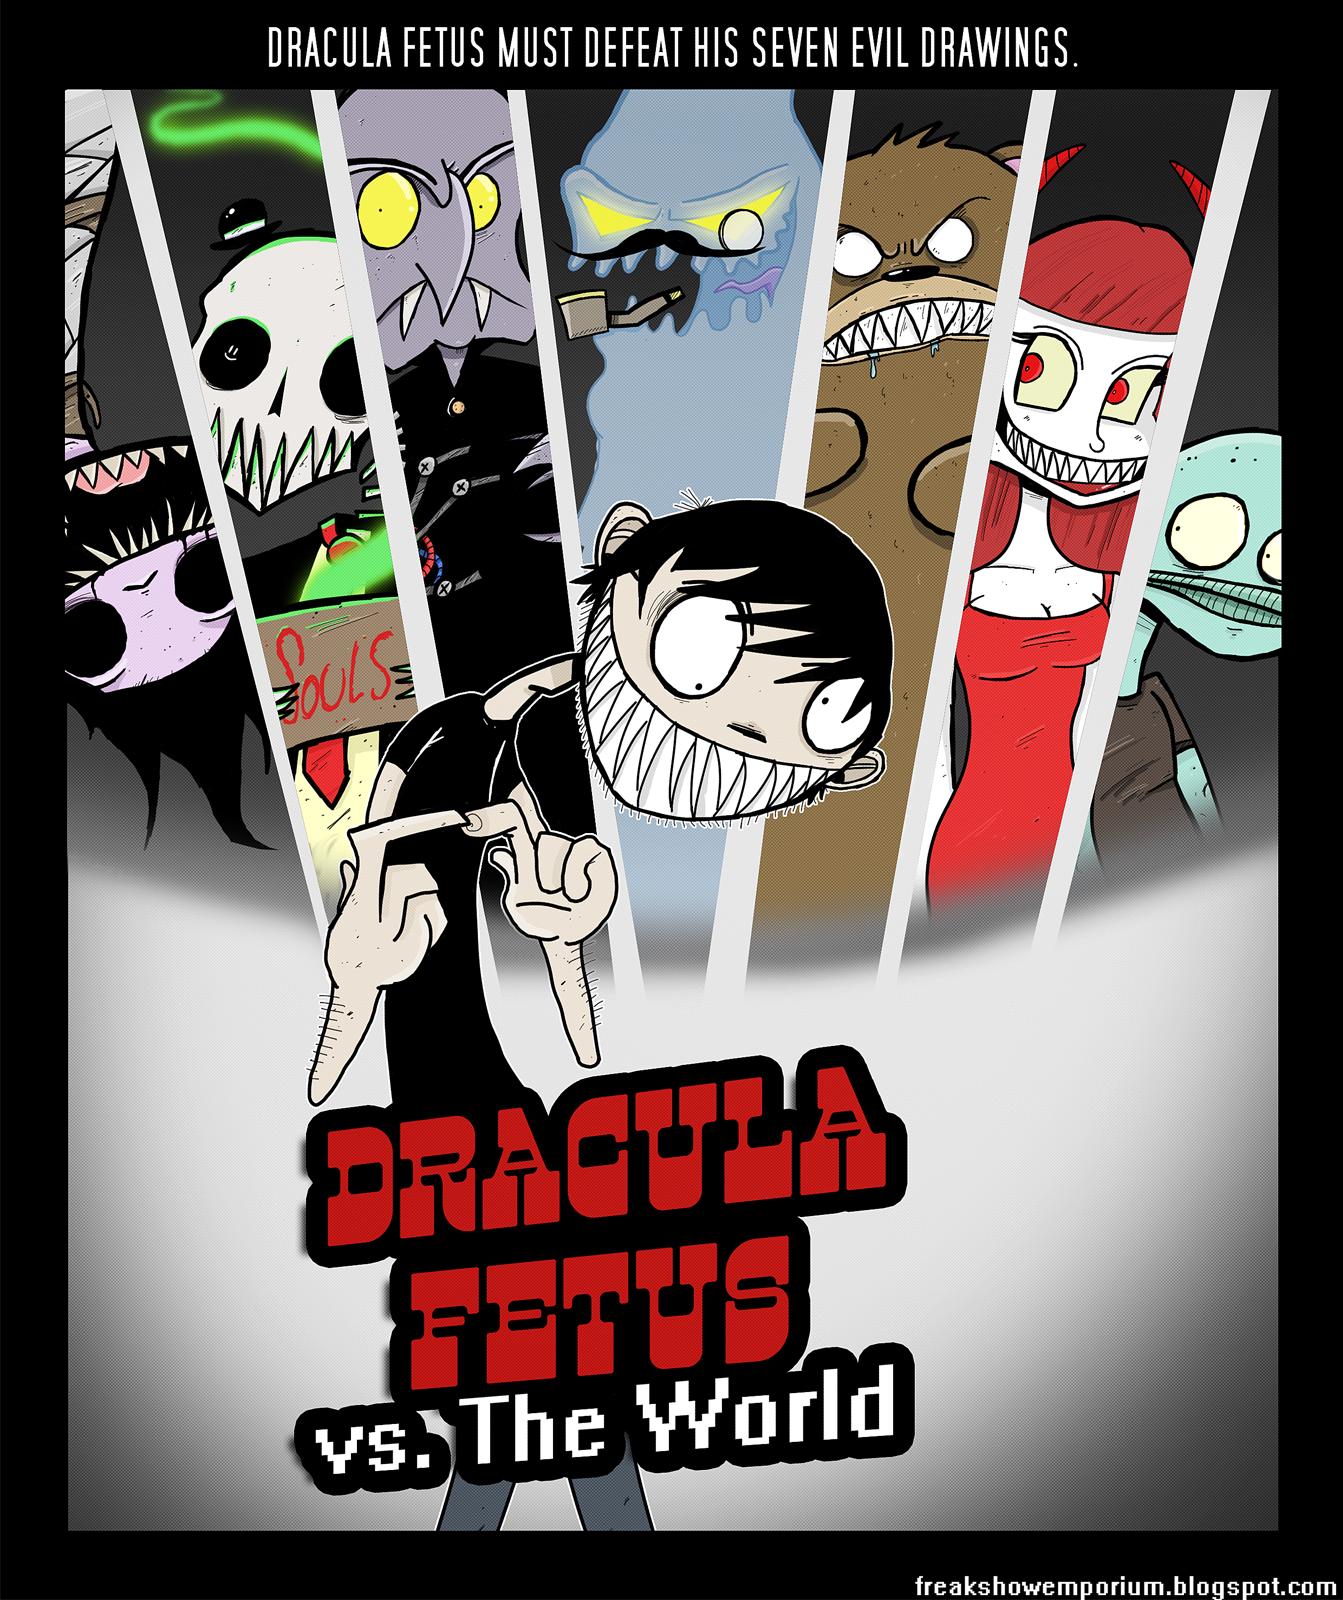 DraculaFetus VS The World